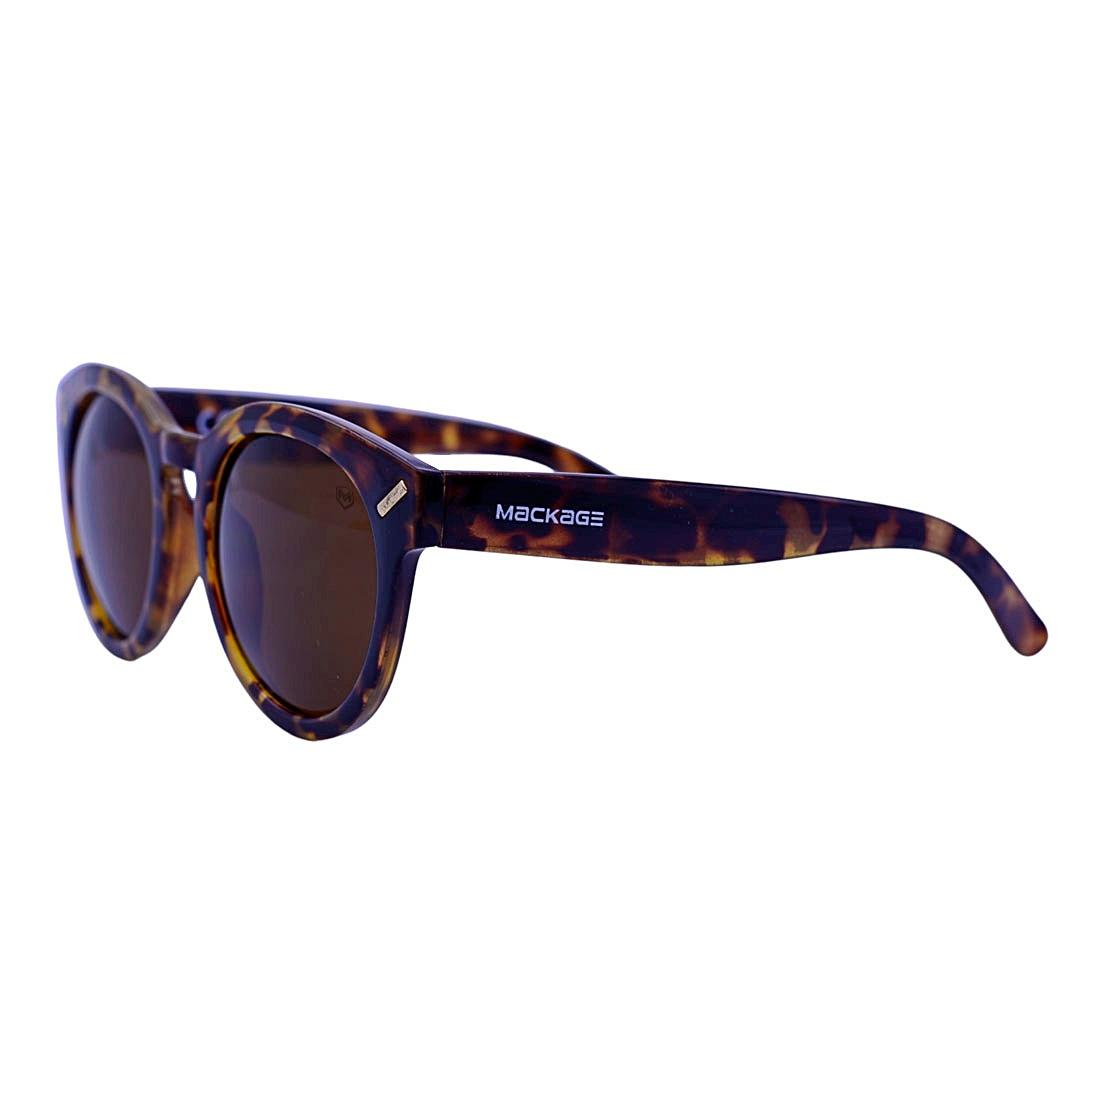 Óculos de Sol Mackage Unissex Acetato Retrô Round - Tarta